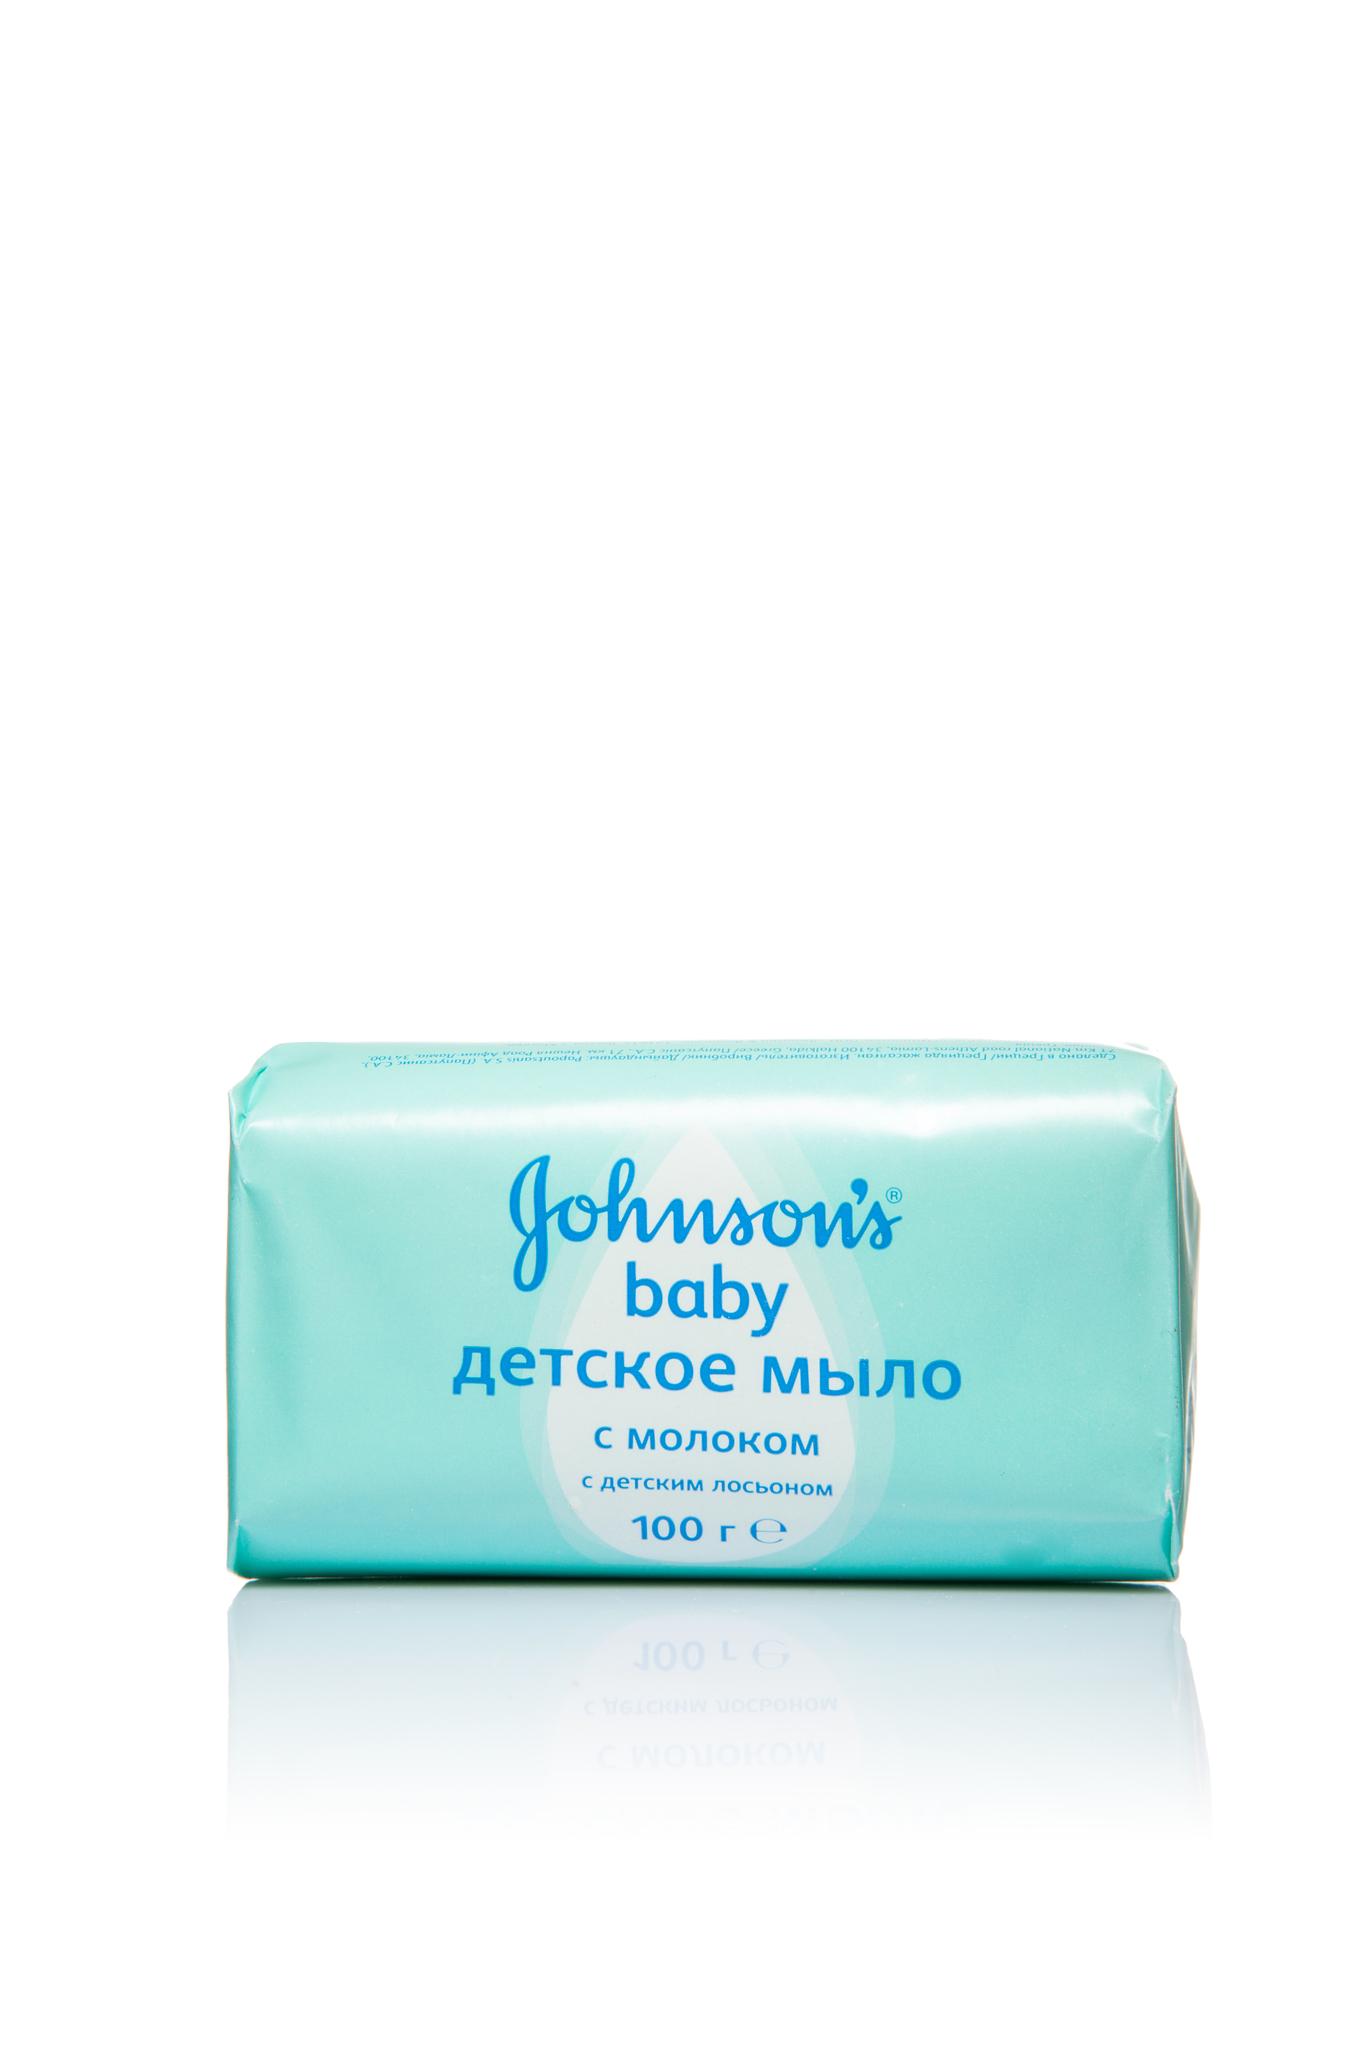 Johnson's Baby Детское мыло с молоком 100 г.